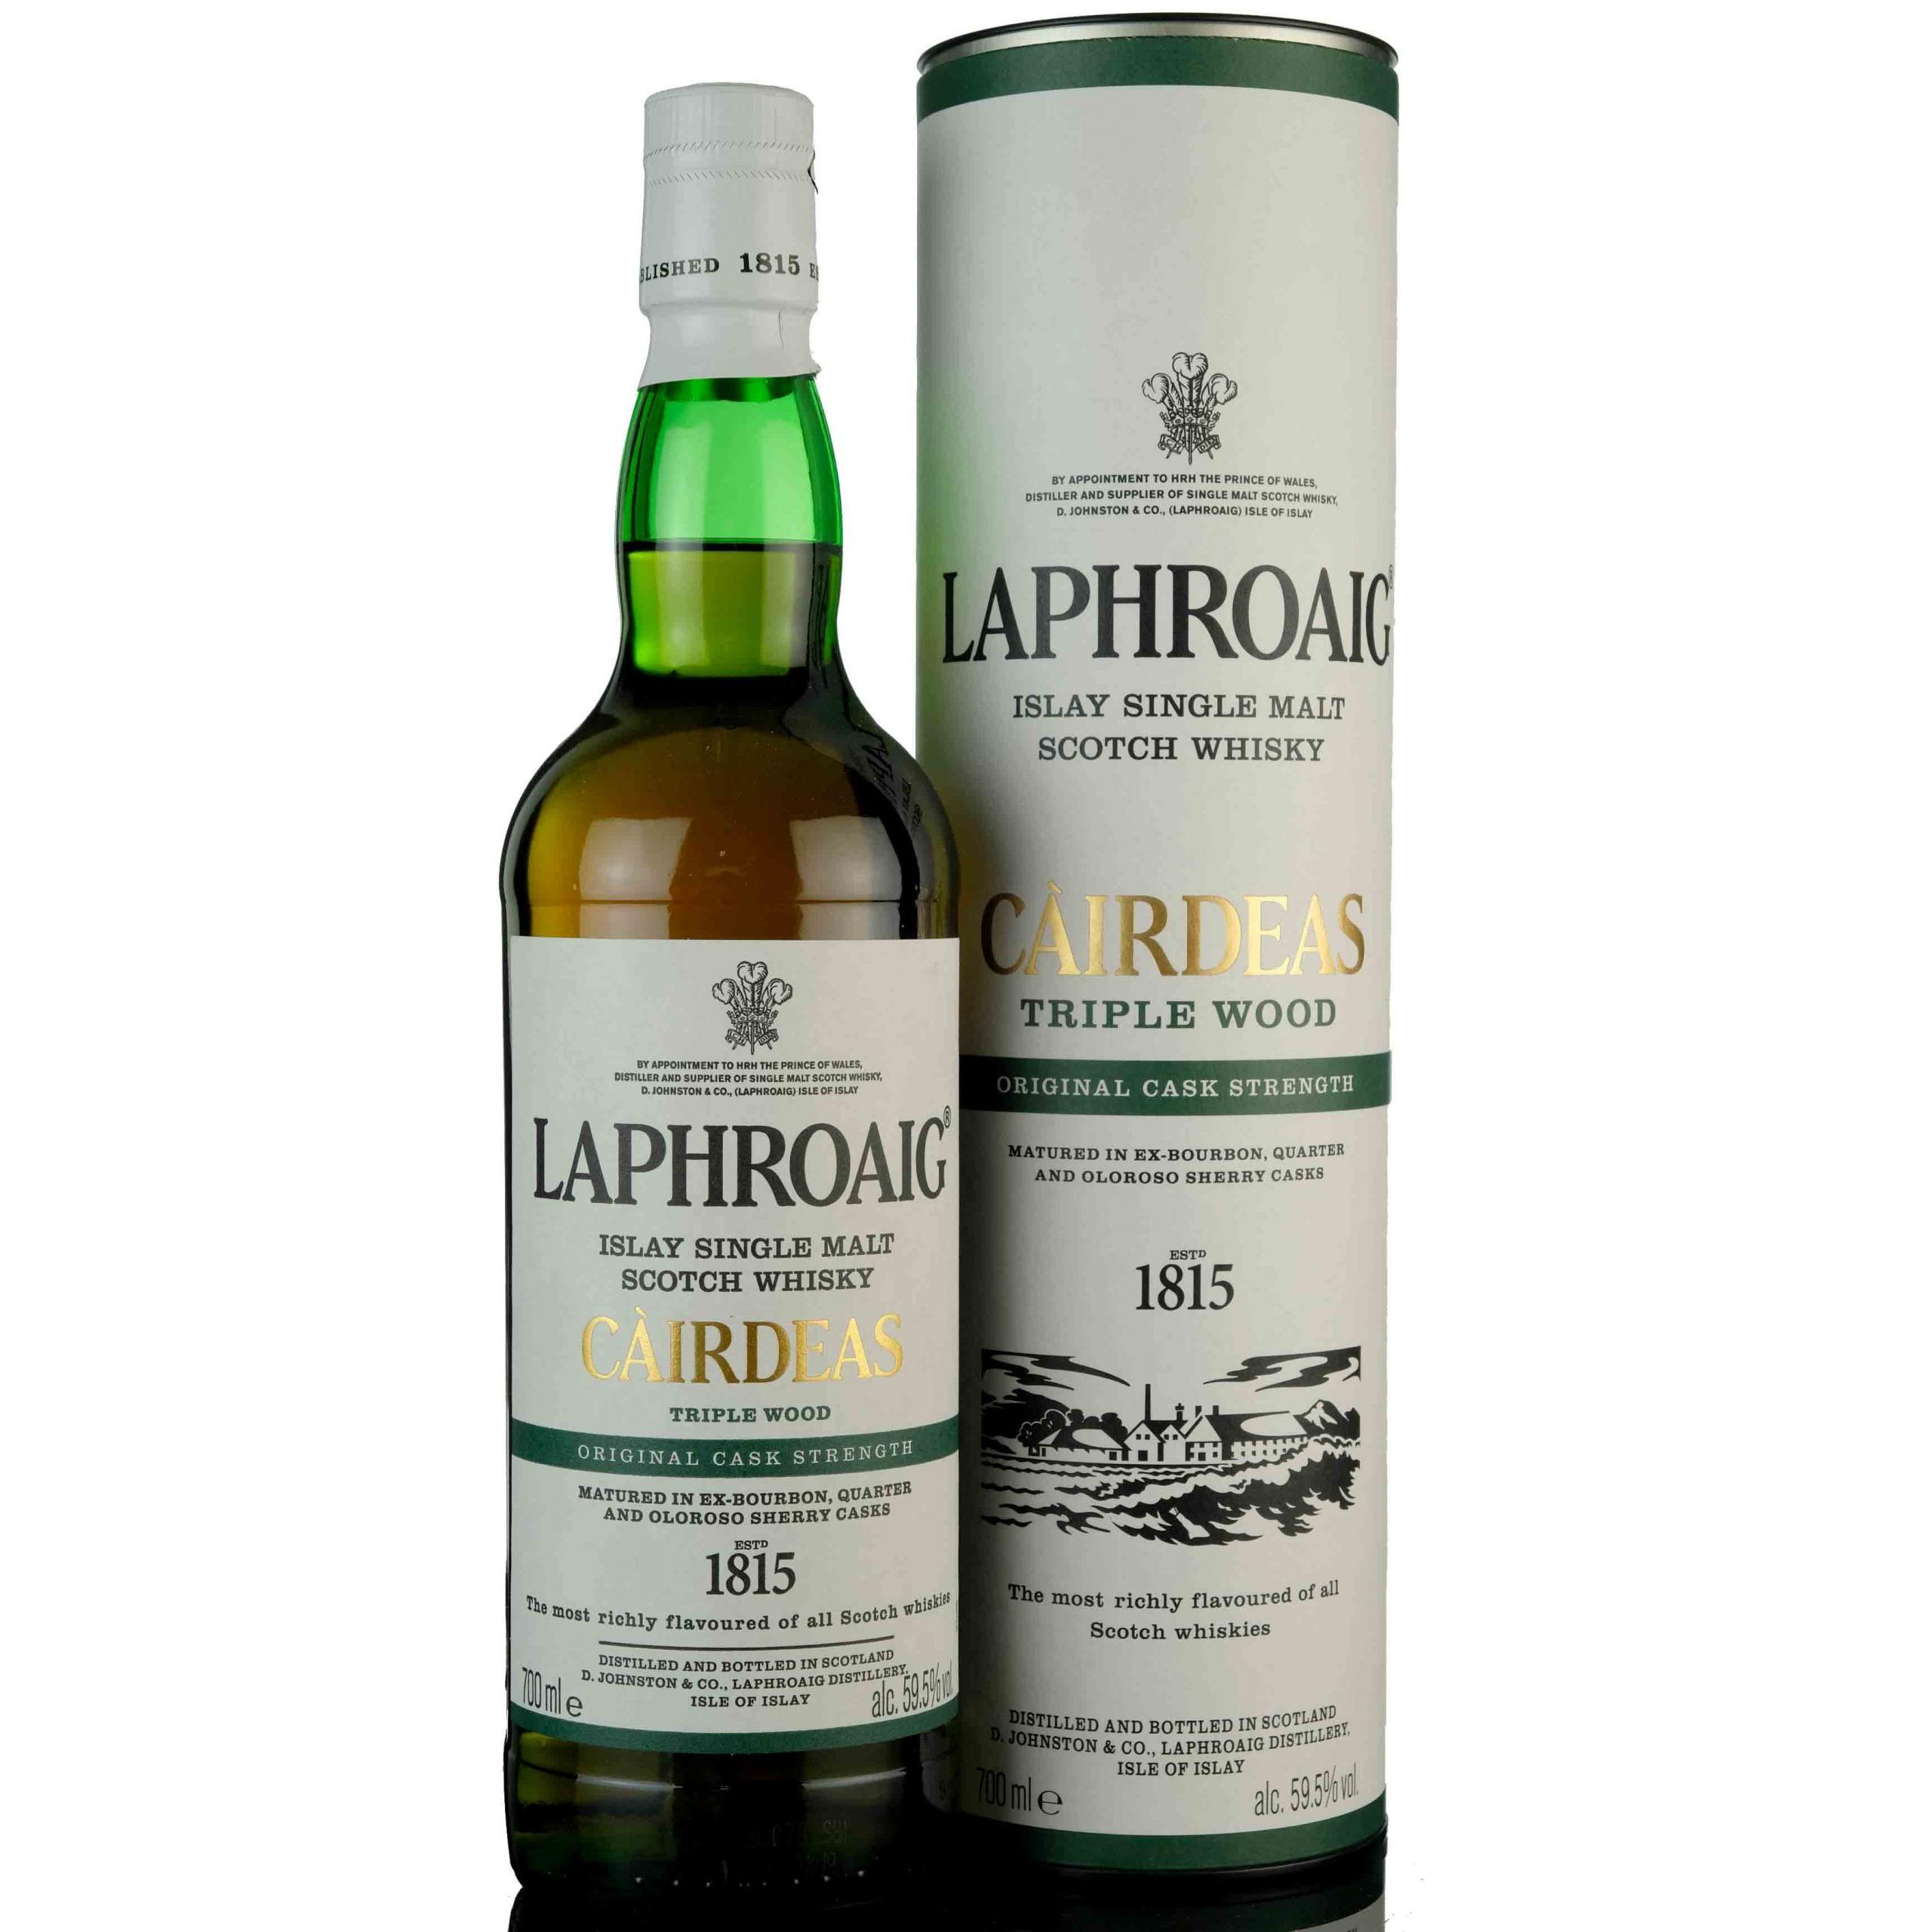 Laphroaig Cairdea Triple Wood 750ml